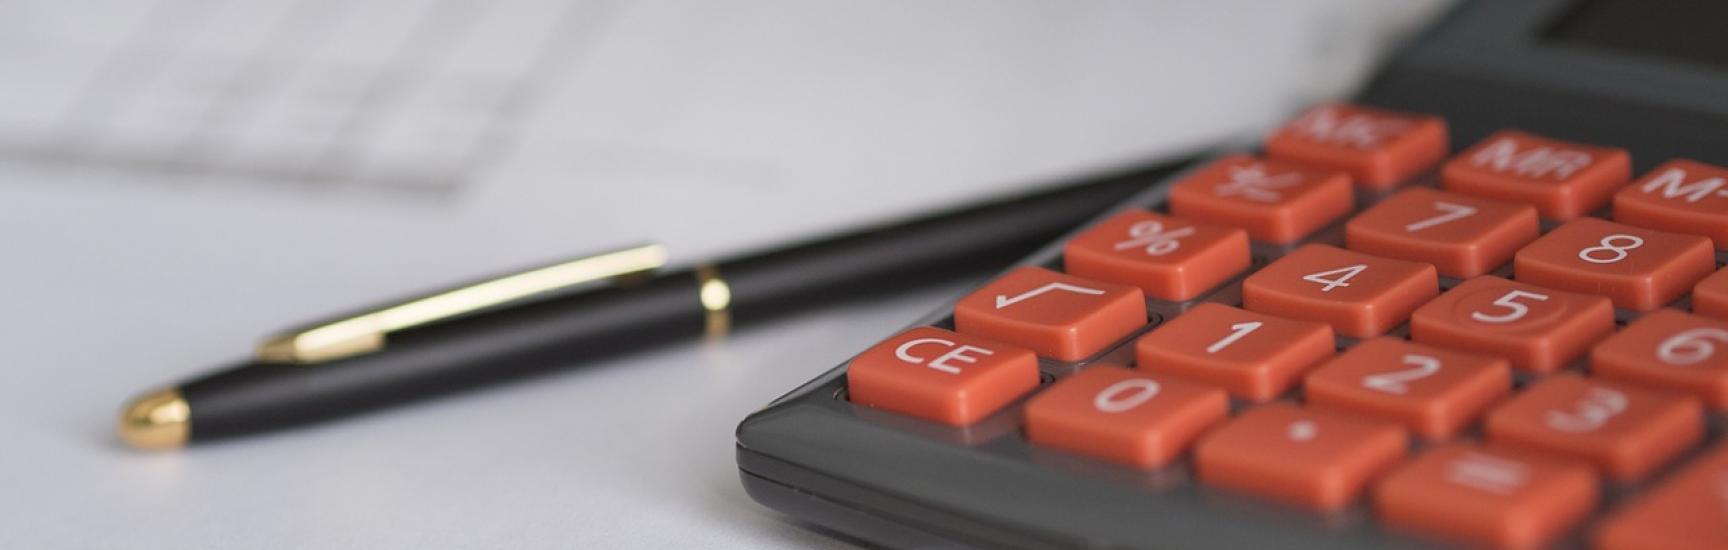 do demerit points affect insurance